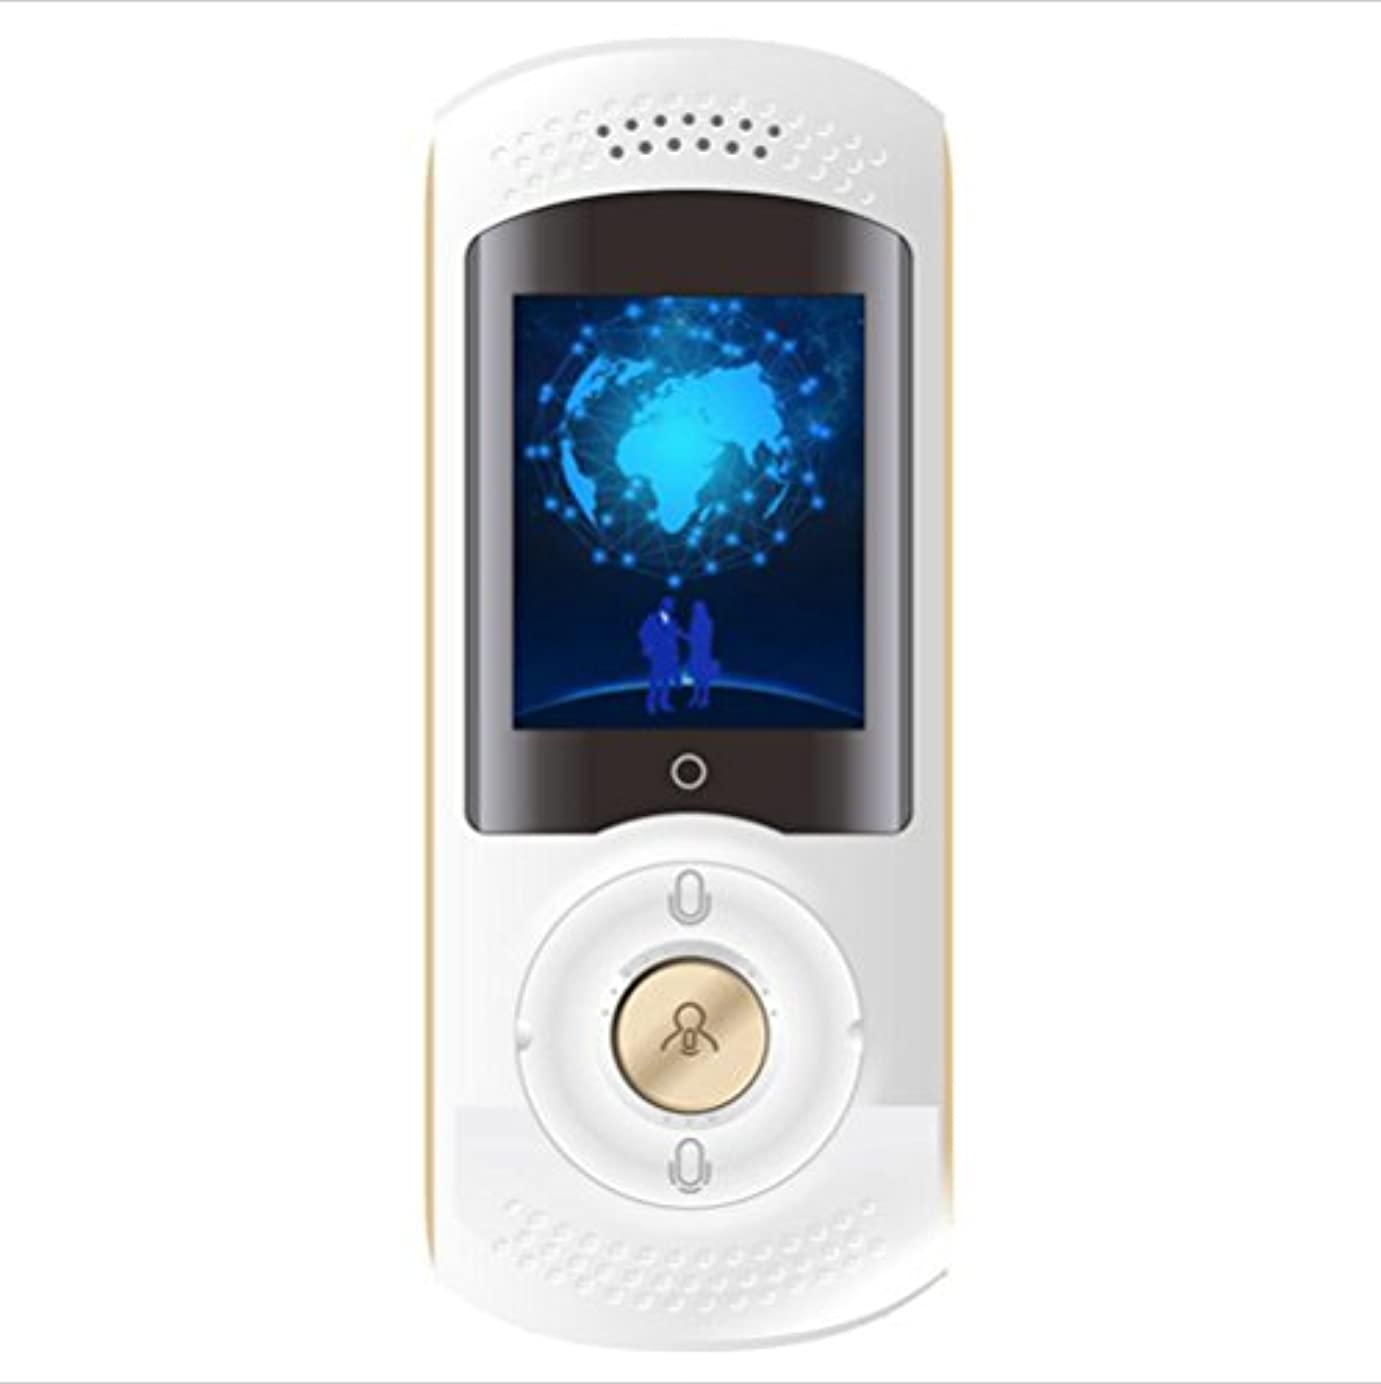 Smart Language Translator 4G Wifiグローバルオンライン45言語インスタントボイス同期翻訳学習旅行ビジネス会議(アップグレード版),White